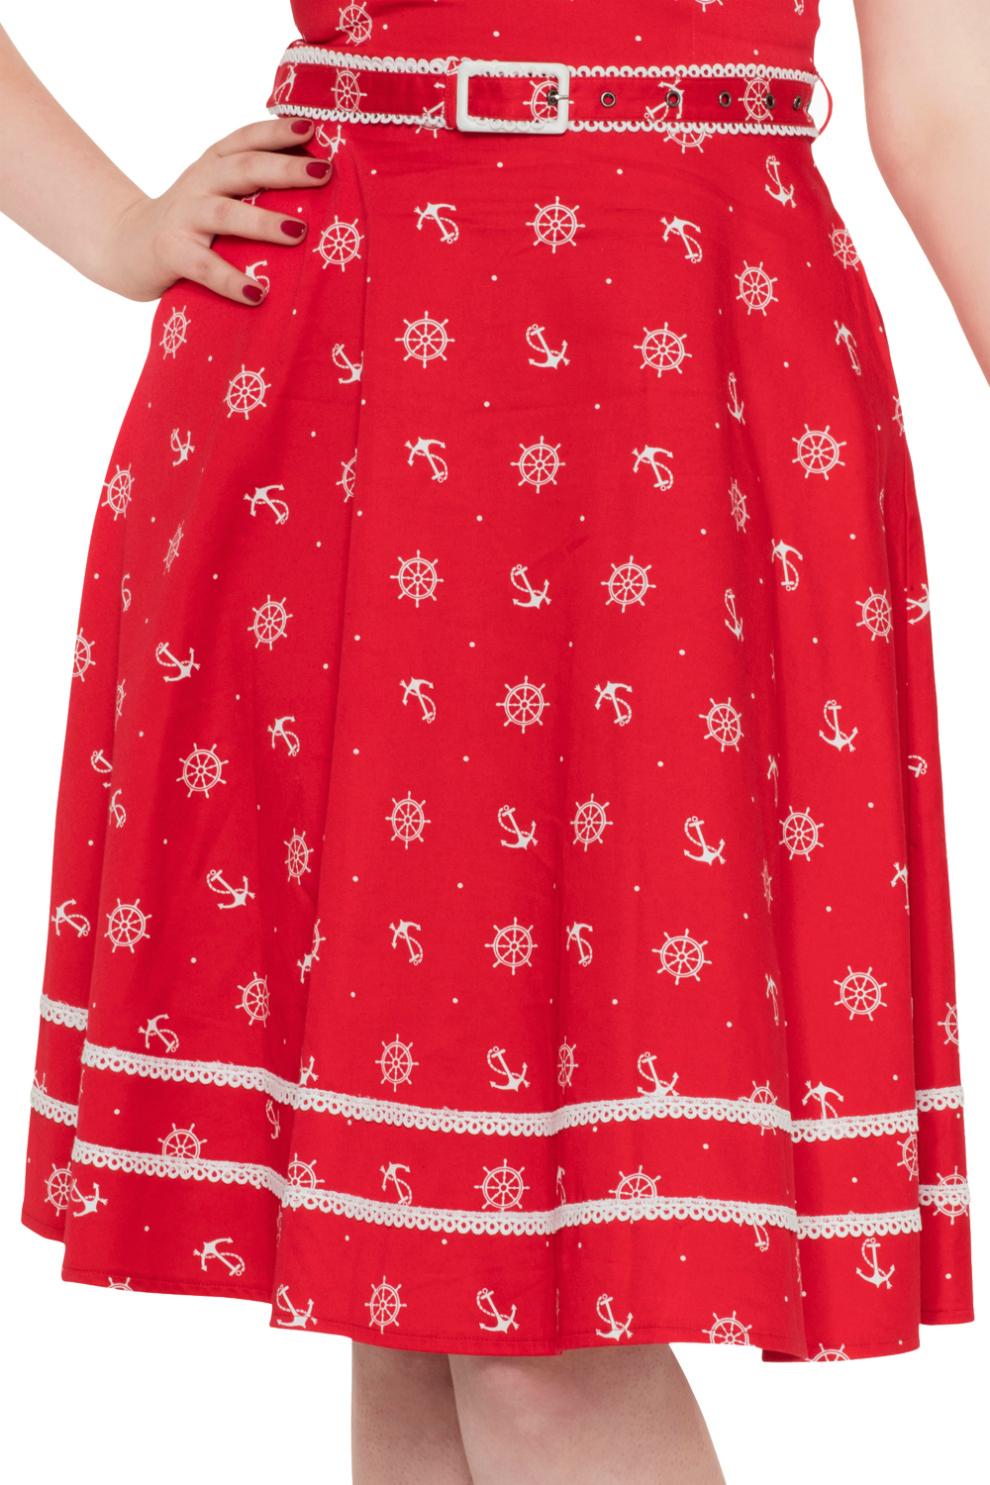 Voodoo Vixen Red Nautical Rockabilly Dress